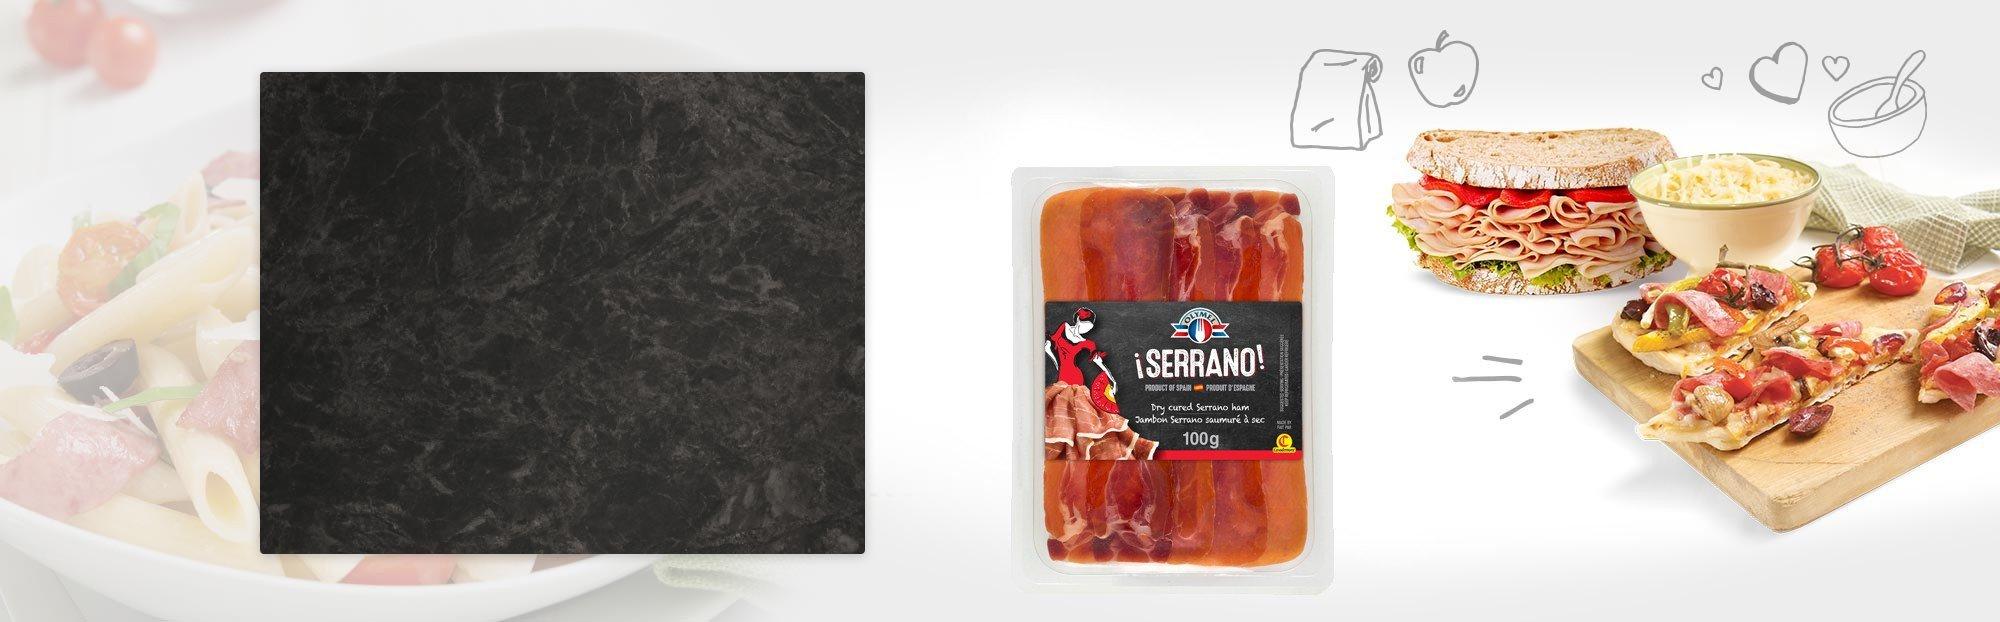 Serrano Jambon Serrano saumuré à sec